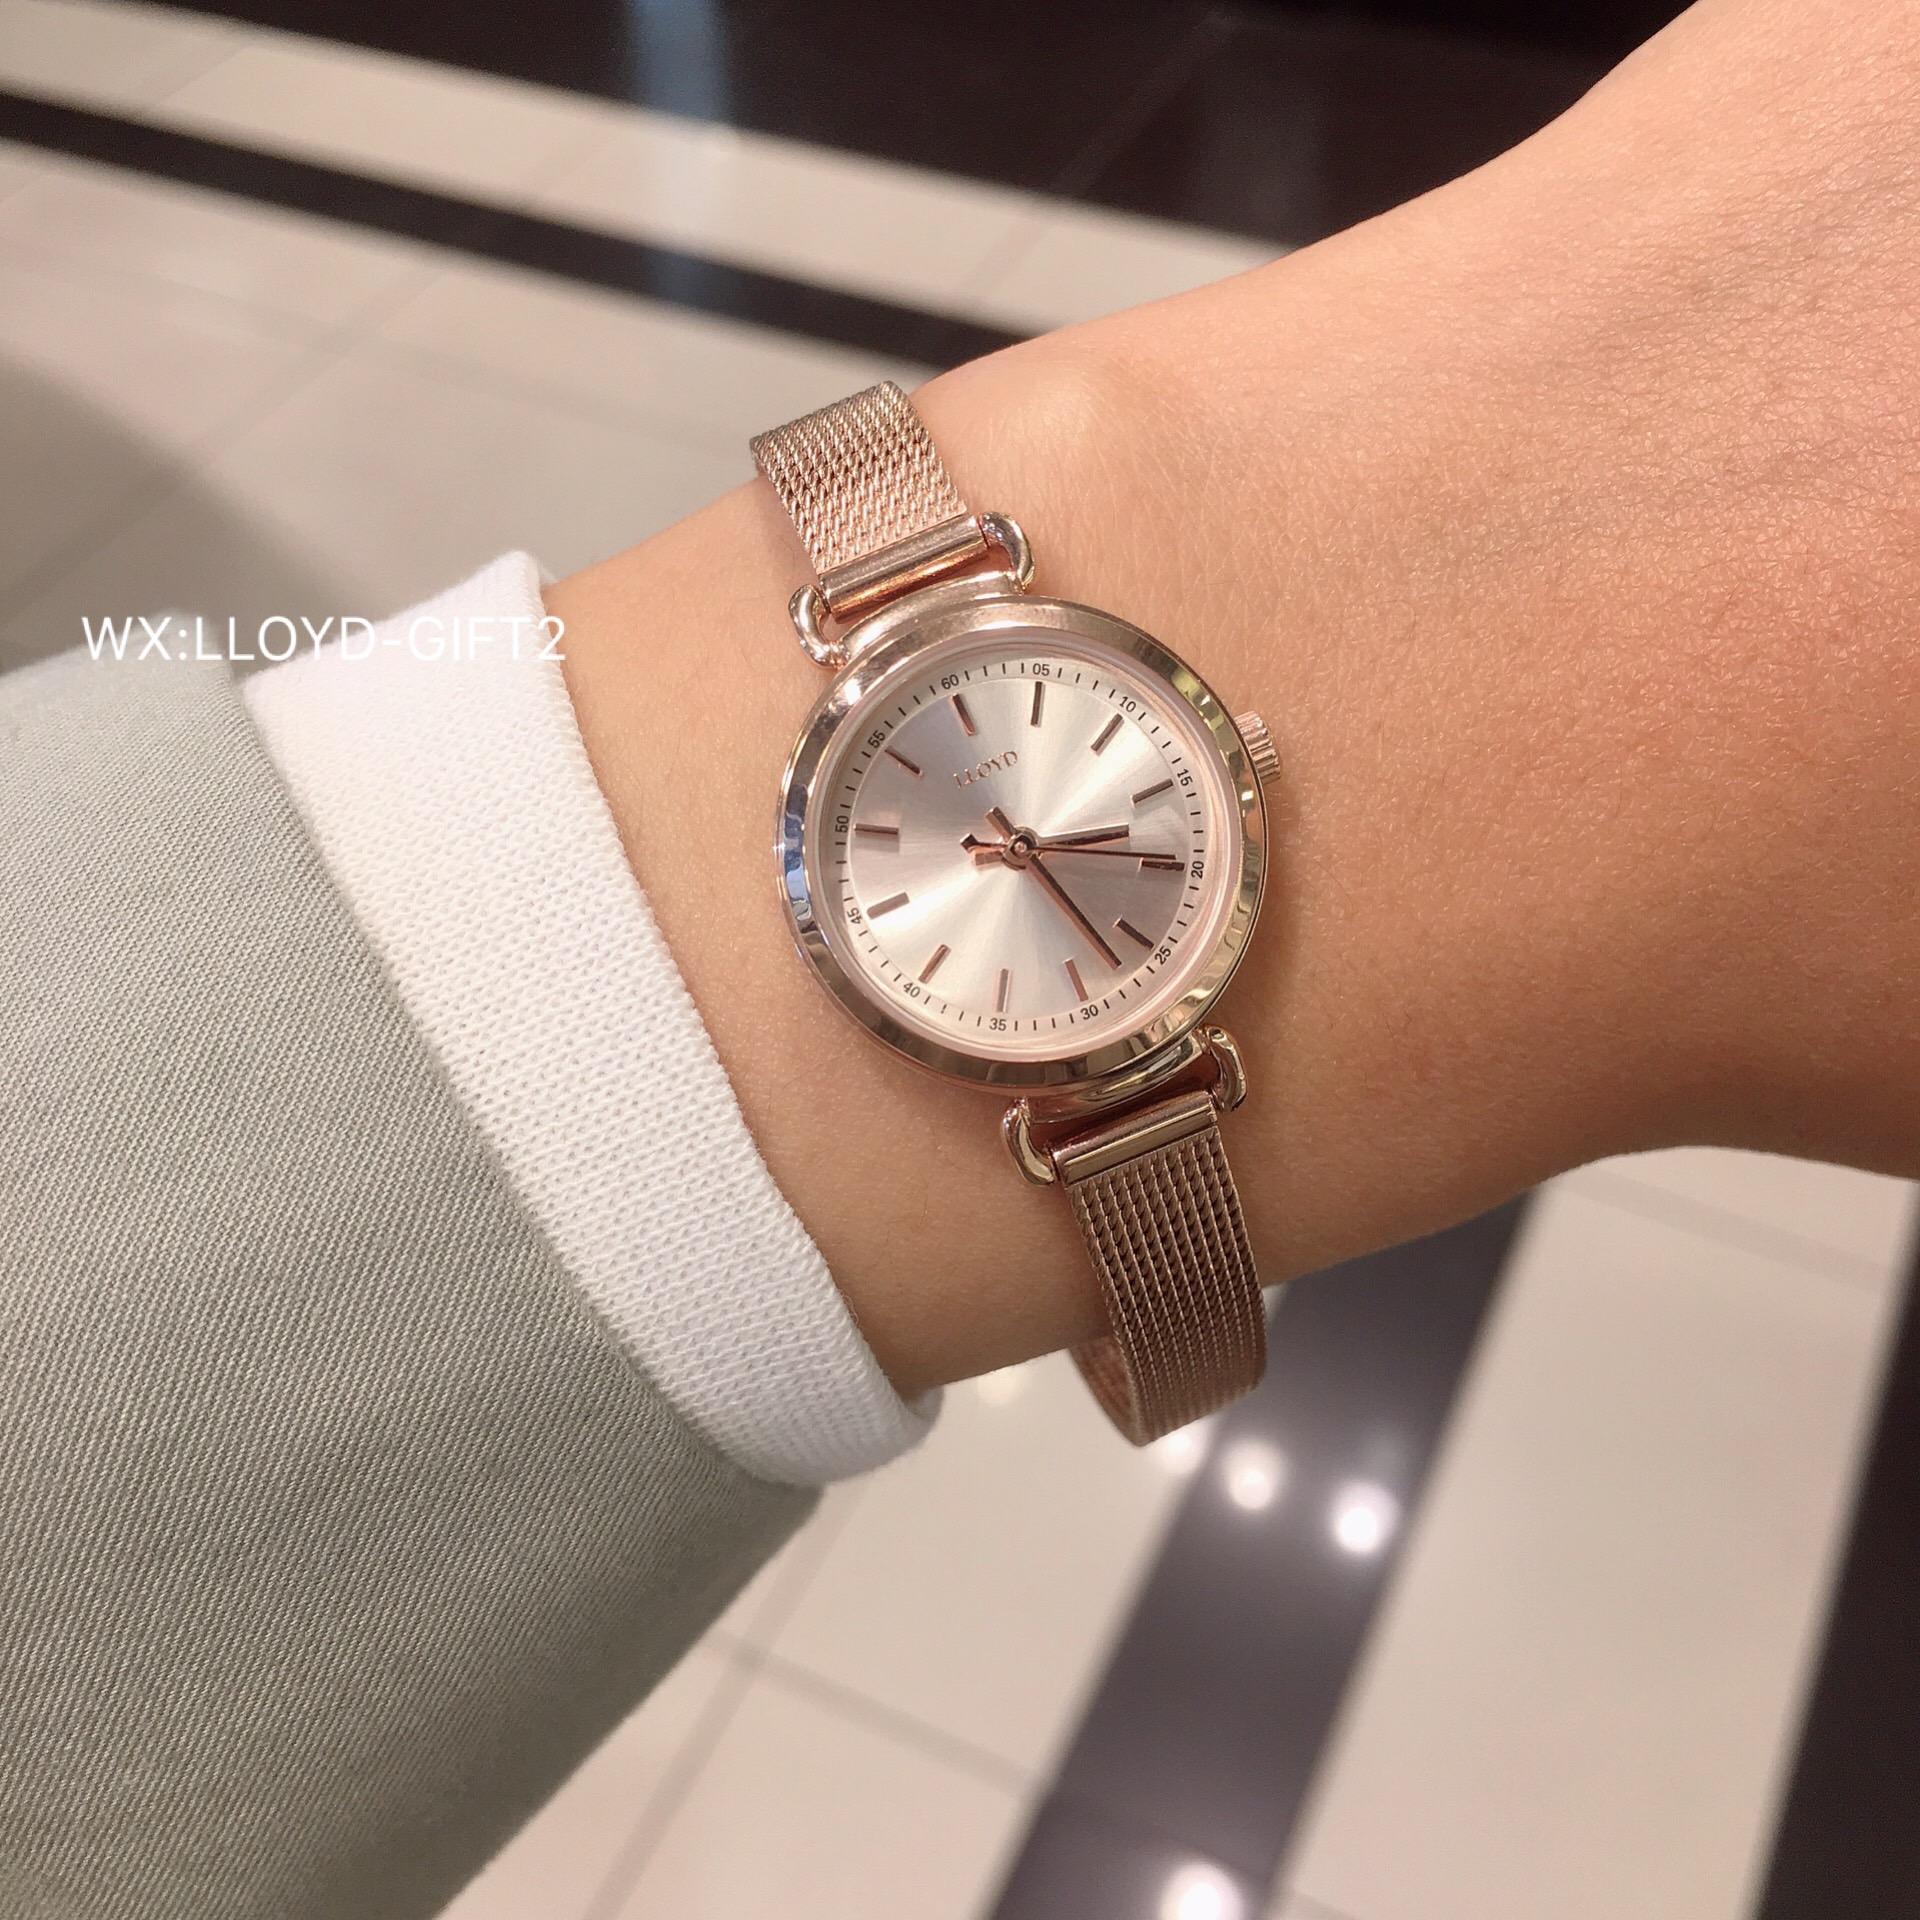 LLOYD韩国专柜代购 韩式简洁数字线条刻度小巧学生女石英手表包邮